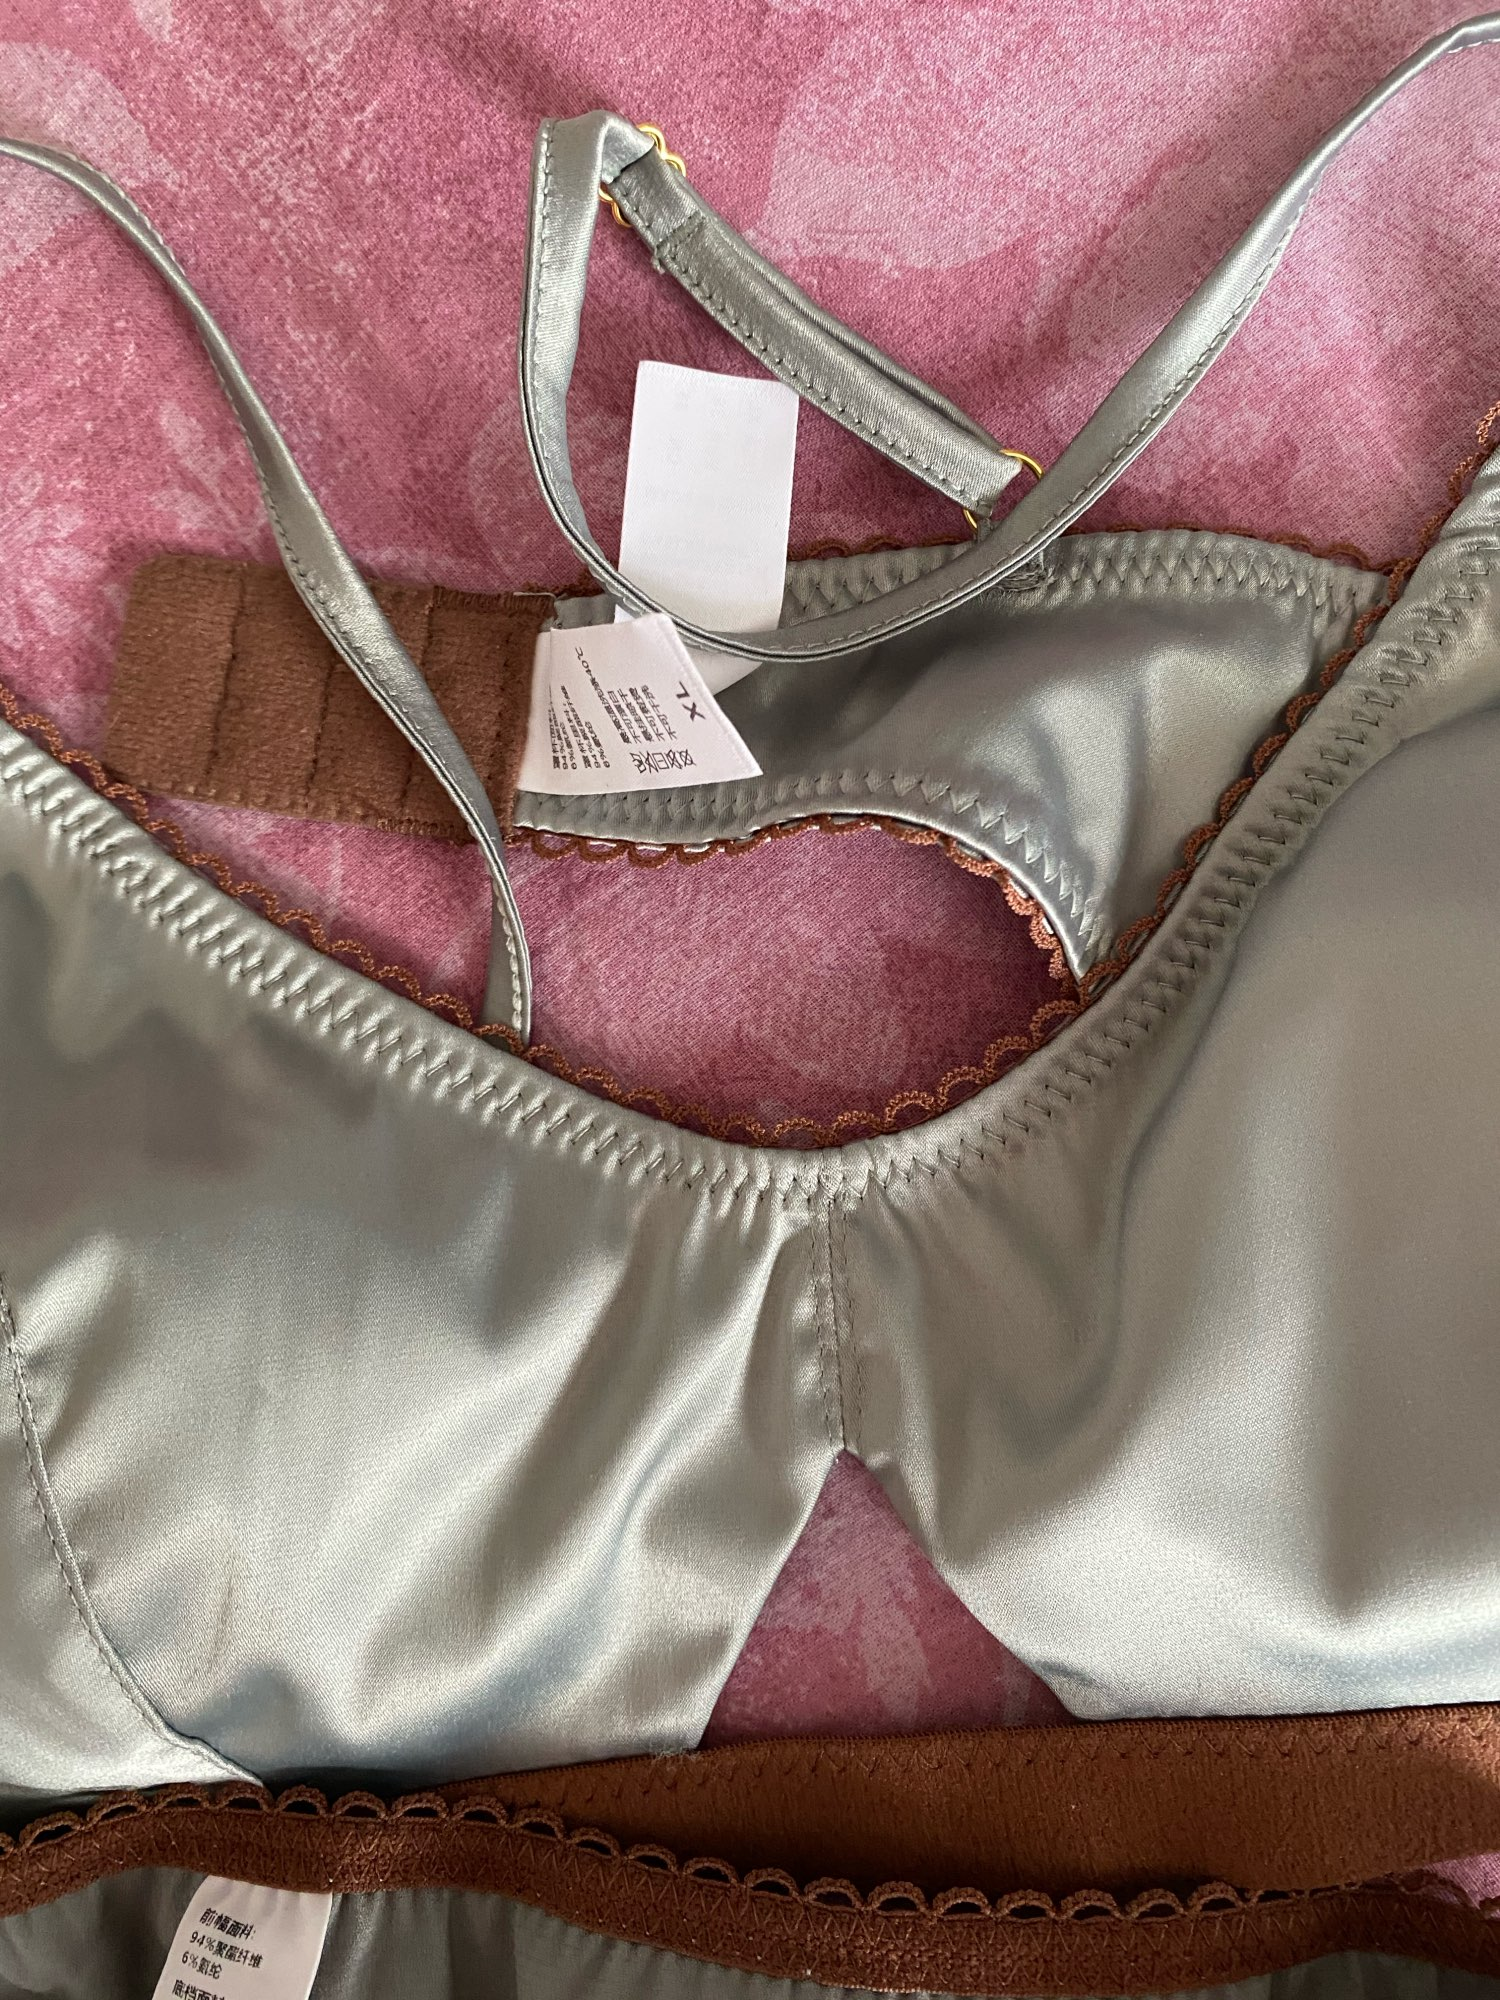 TERMEZY New Women Underwear Wire Free satin bra thin 3/4 cups Bra and Panty Set Hollow Lingerie Women Brassiere Bralette|Bra & Brief Sets|   - AliExpress